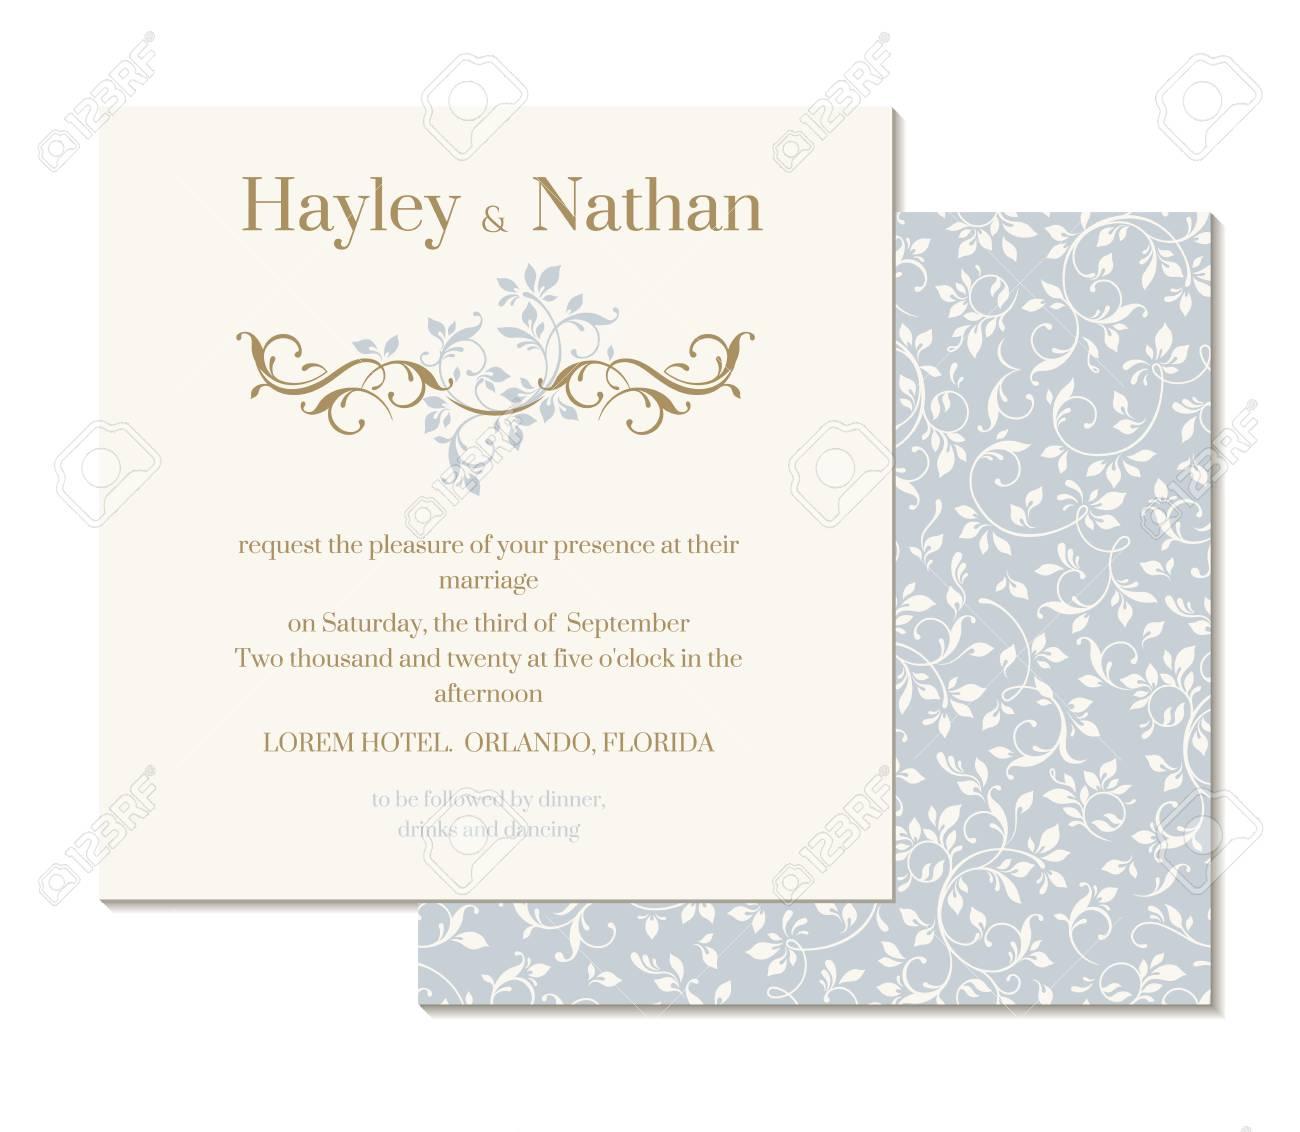 Decorative Floral Border. Wedding Invitation. Floral Seamless ...